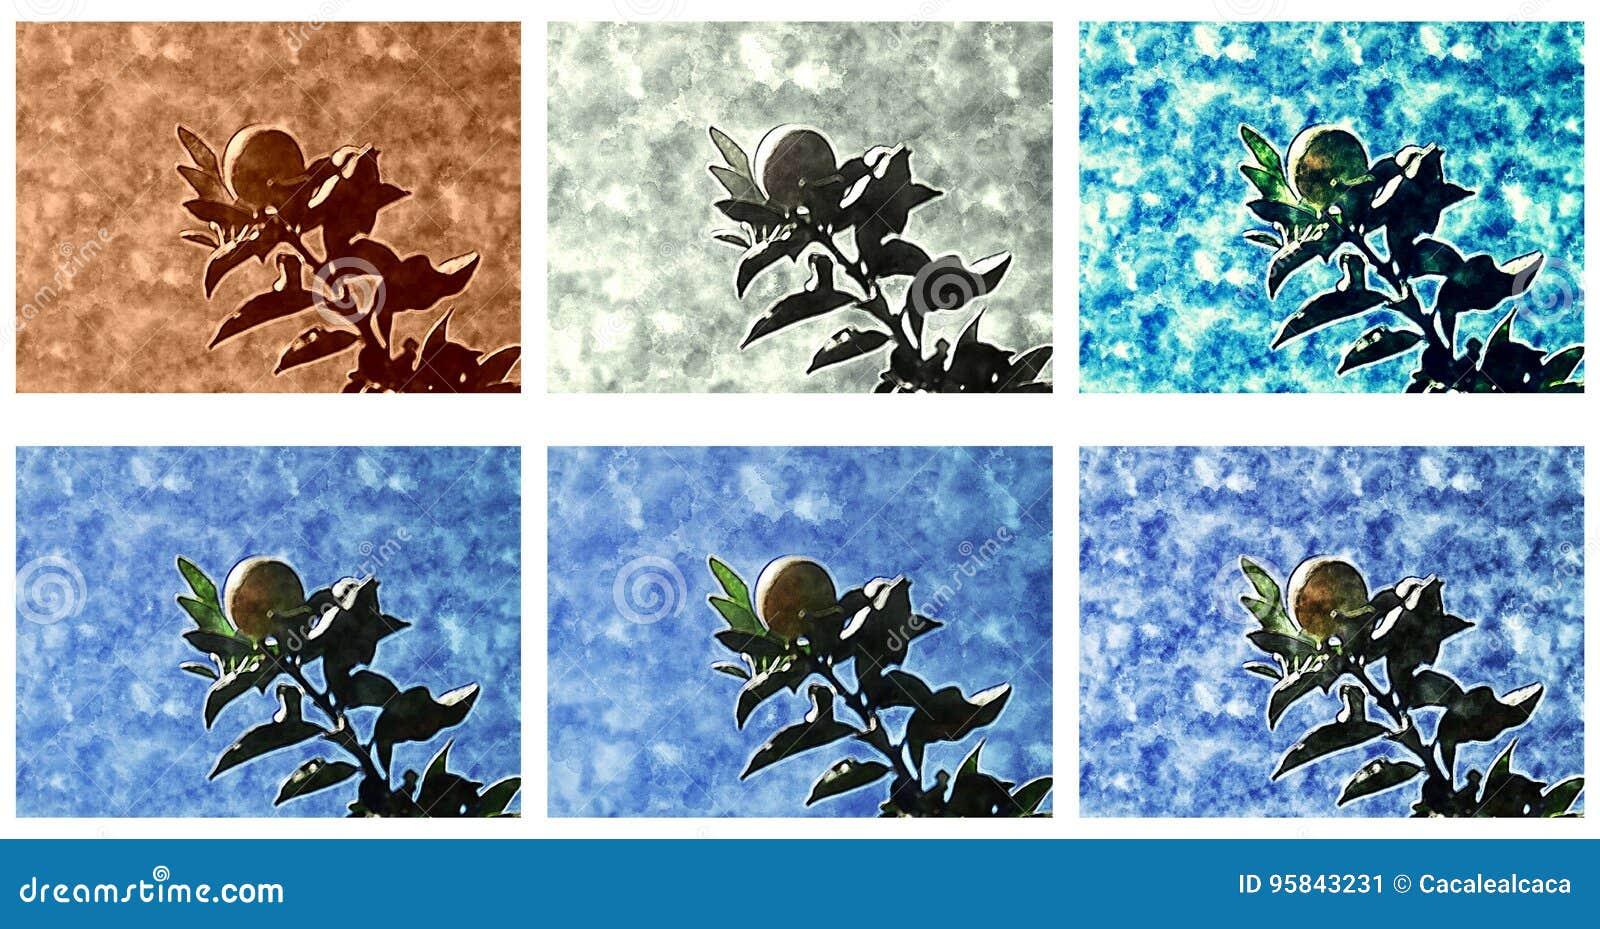 Kumquat - Achtergrond, grens of textuur